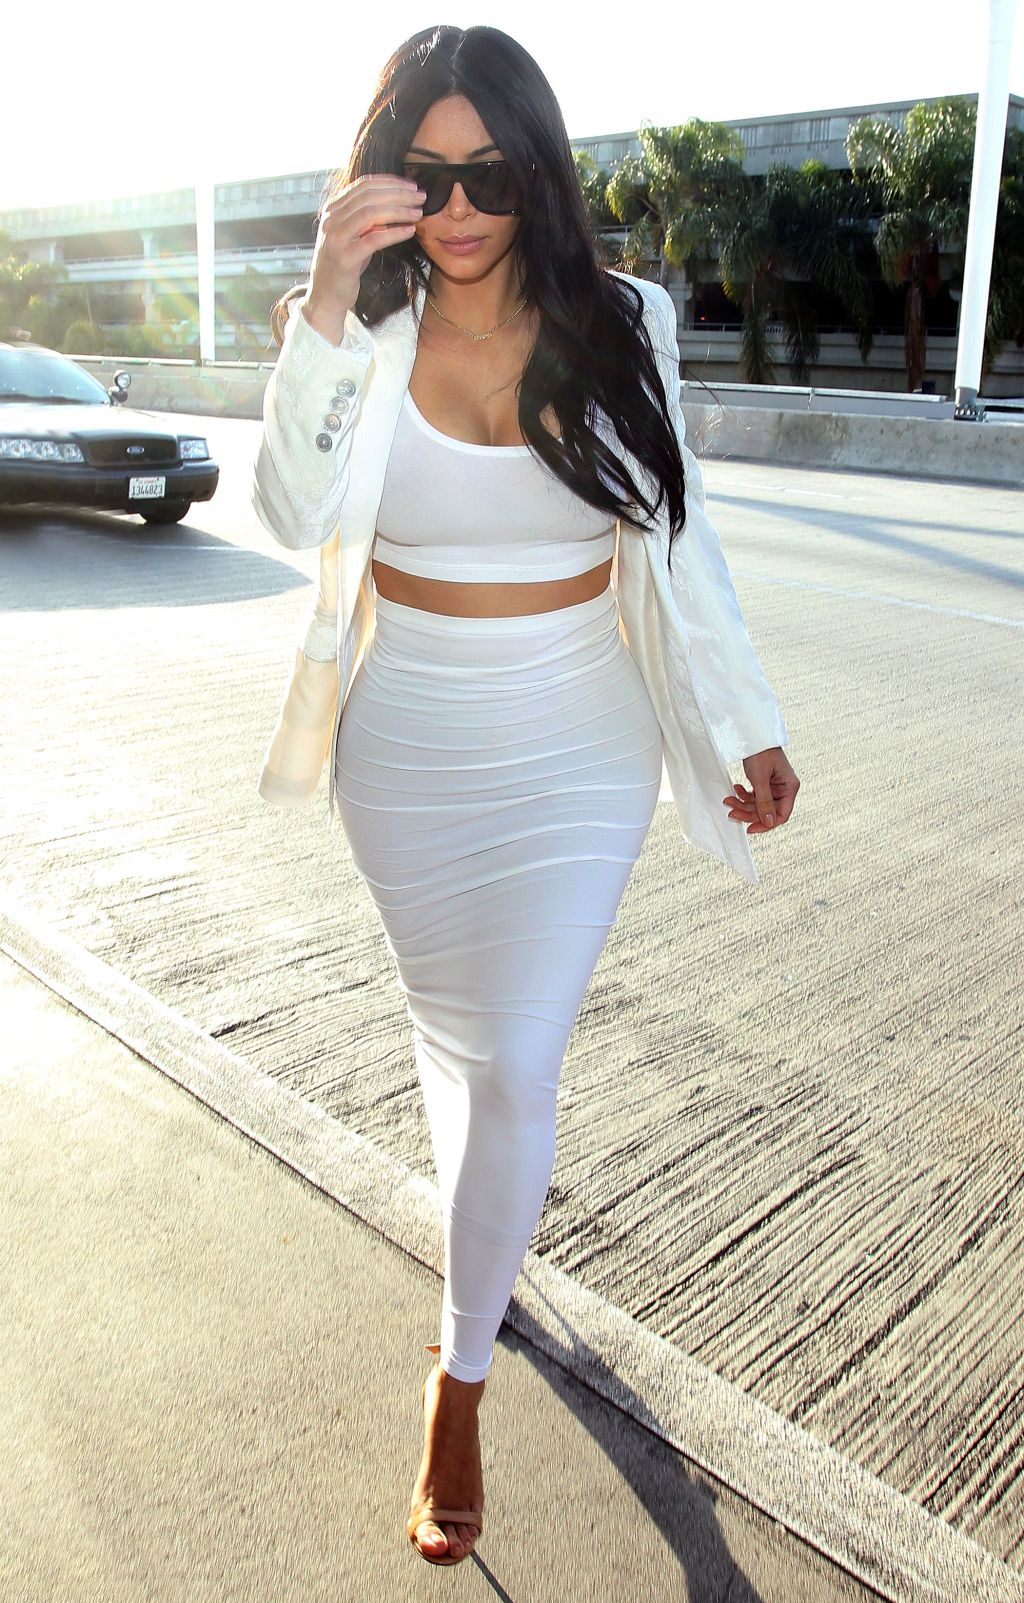 Kim Kardashian at LAX, heading to Brazil